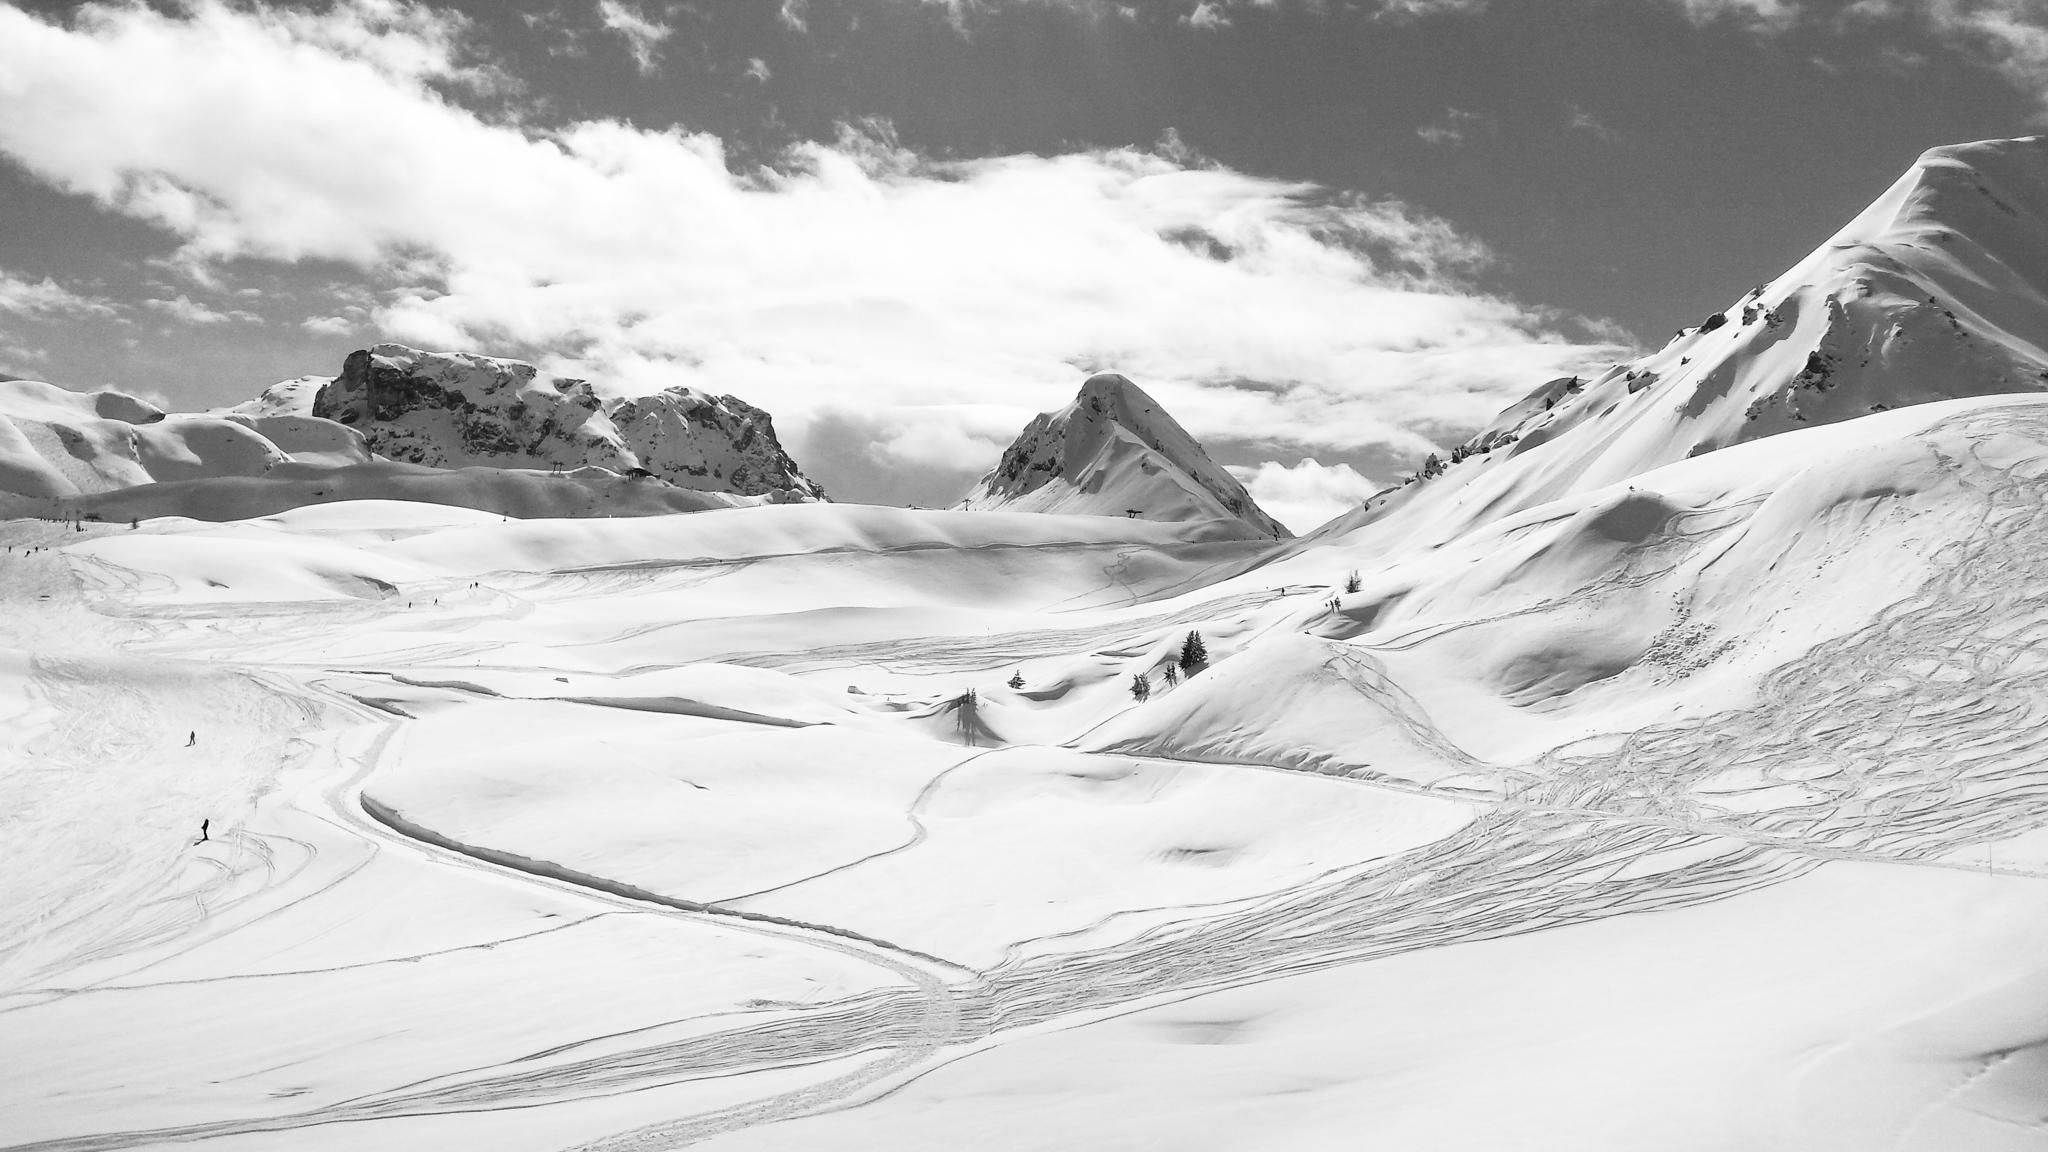 114942-snowboarding-photographer.jpg